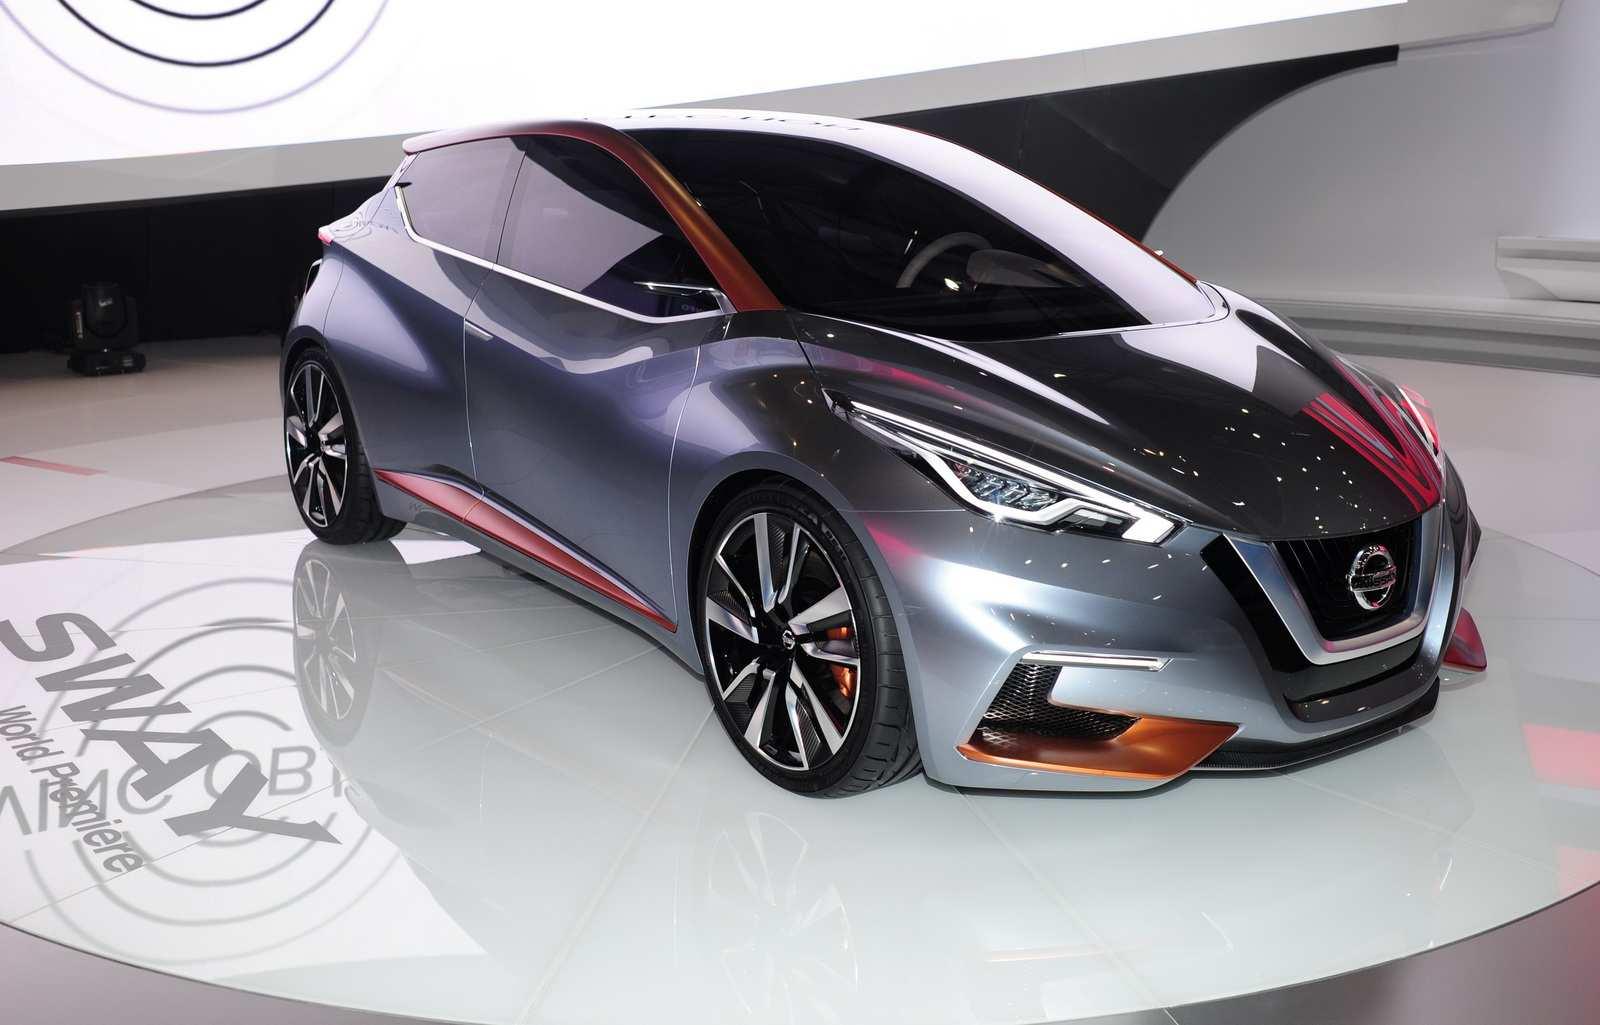 22 Concept of Nissan Micra 2020 Canada Wallpaper for Nissan Micra 2020 Canada